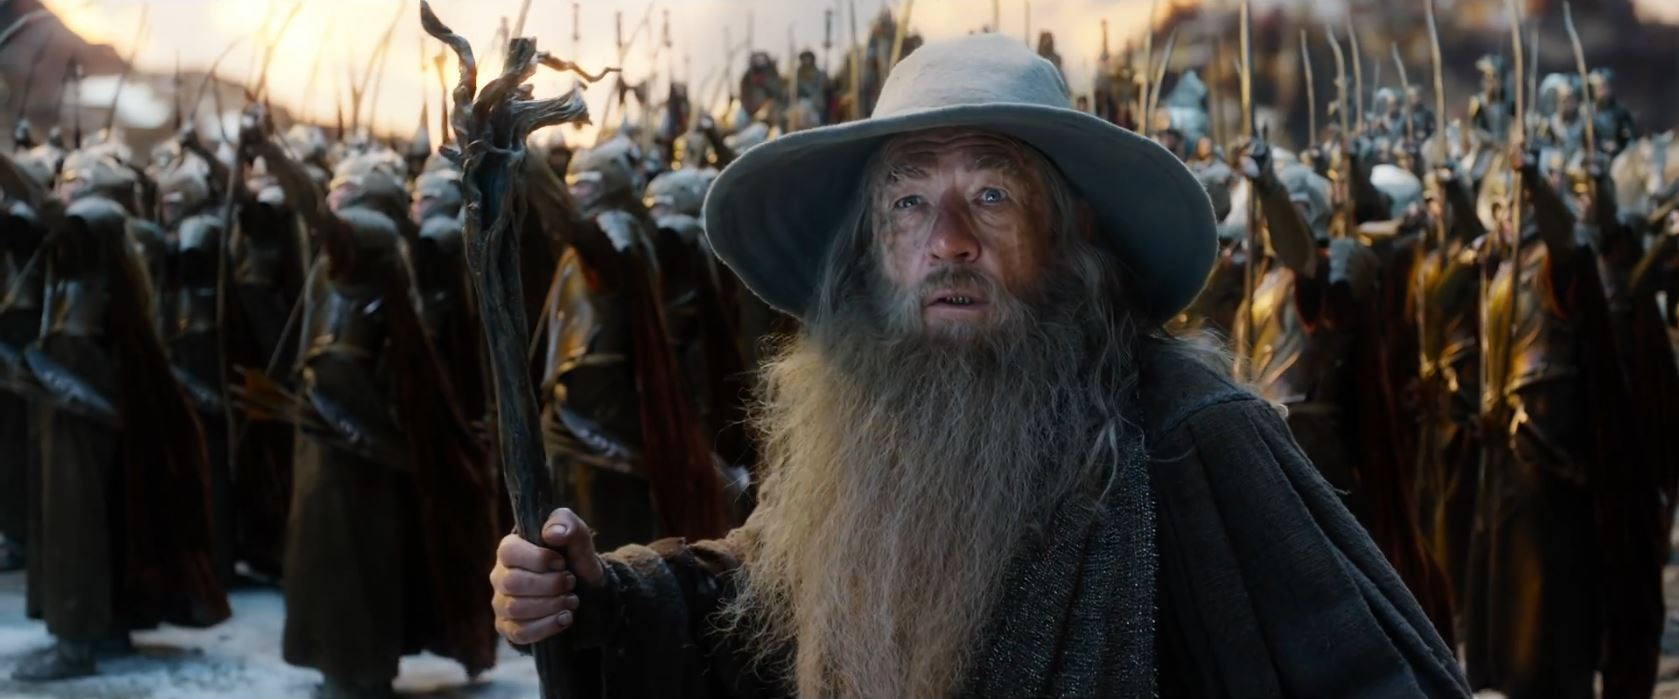 The Hobbit The Battle of the Five Armies Trailer - Ian McKellen as Gandalf